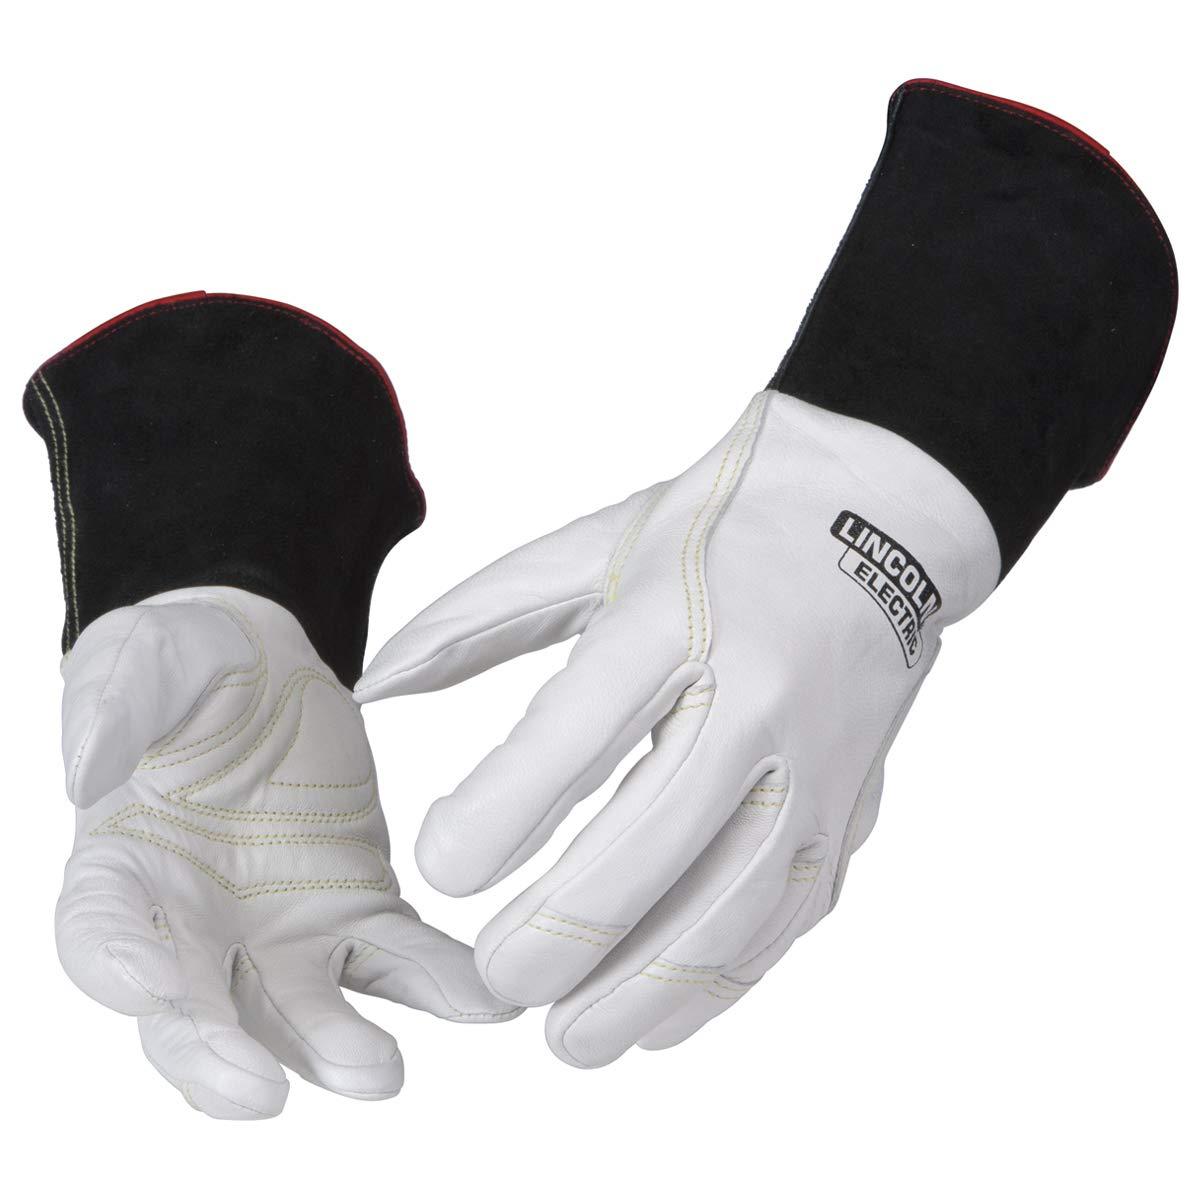 Lincoln Electric Premium TIG Welding Gloves | Top Grain Leather | High Dexterity | Medium | K2983-M